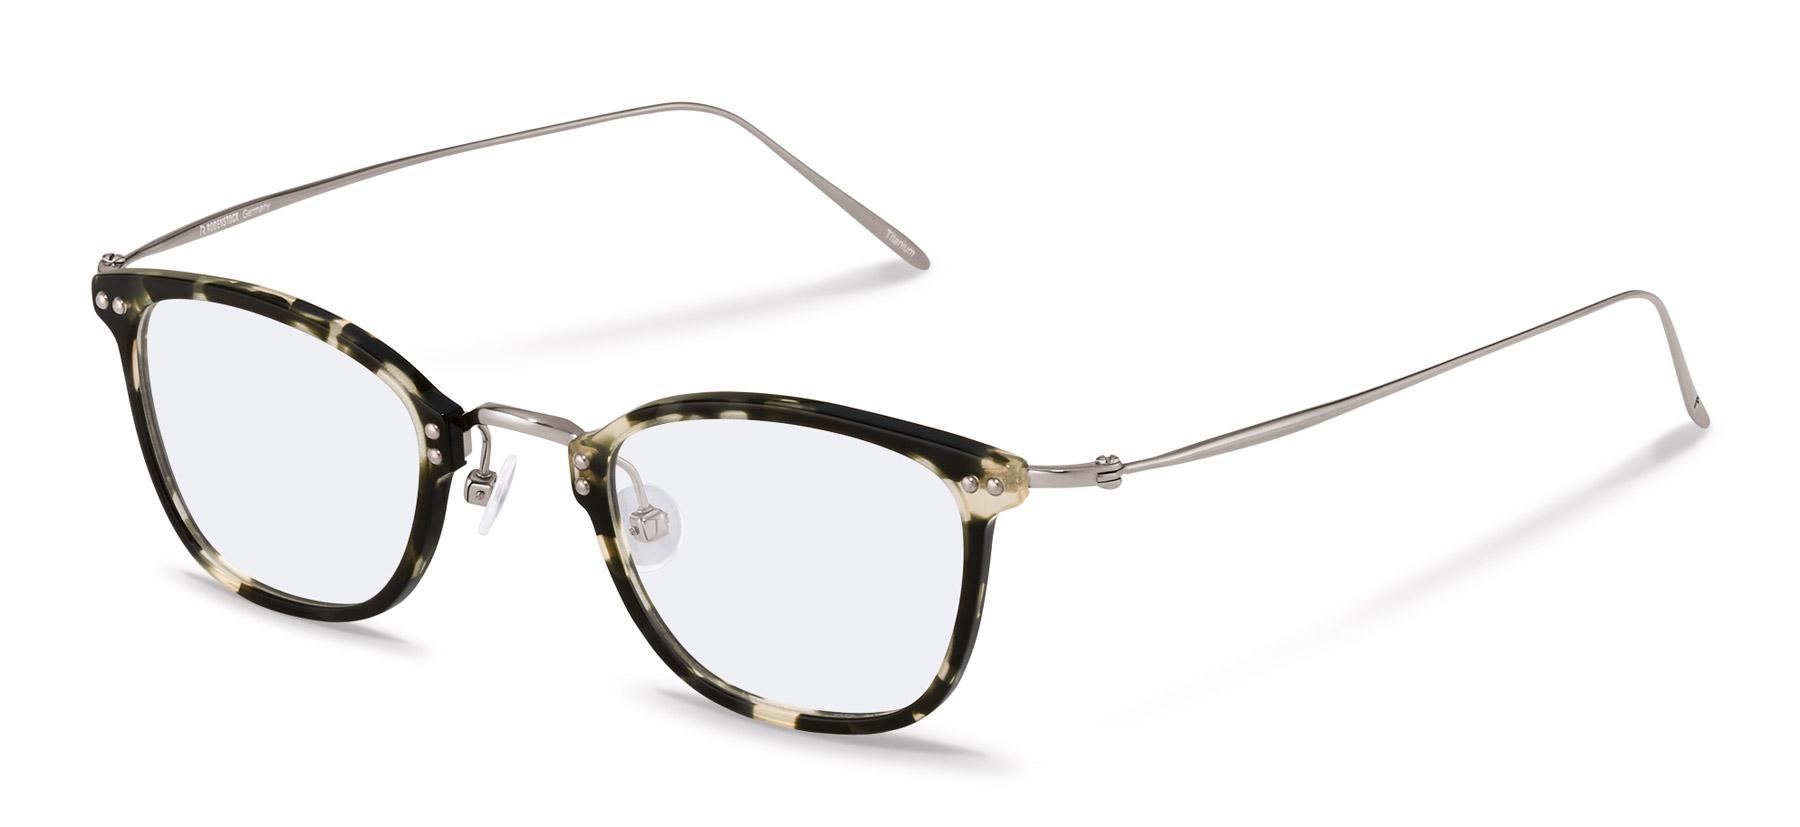 Occhiali da Vista Rodenstock R7059 D 2klpMpyb